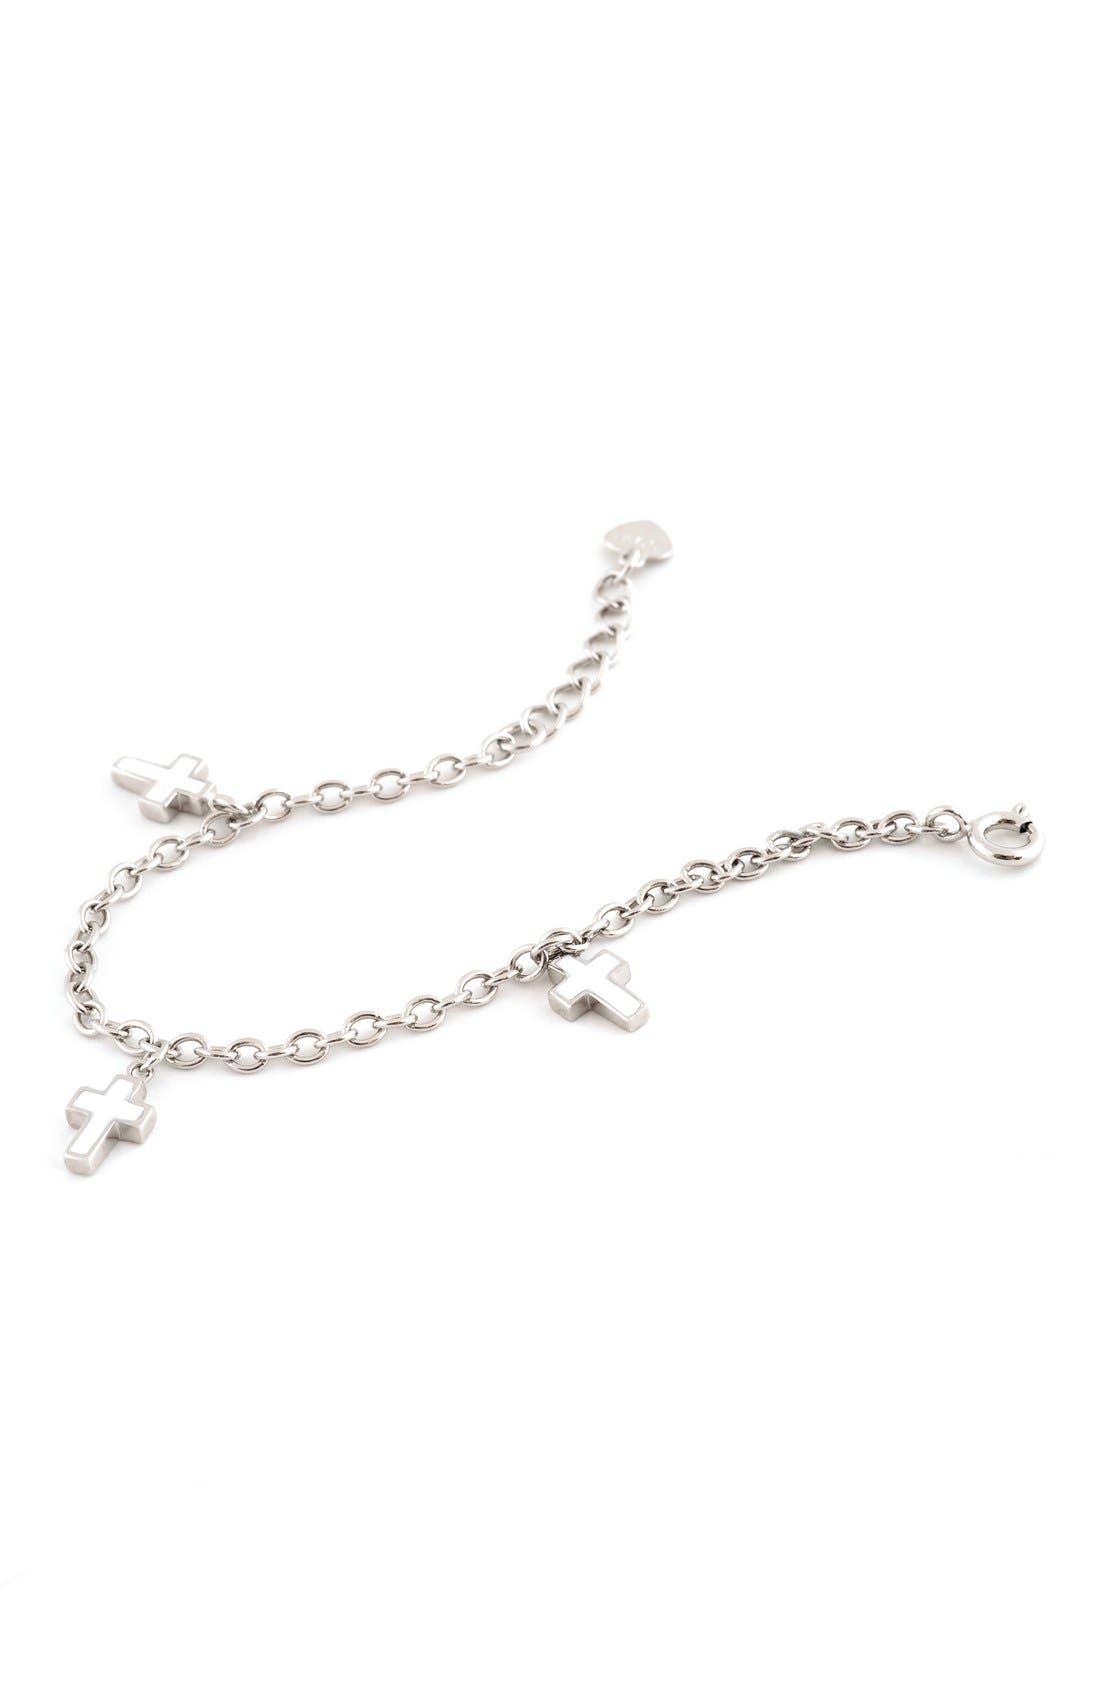 Enameled Cross Sterling Silver Charm Bracelet,                             Main thumbnail 1, color,                             NONE